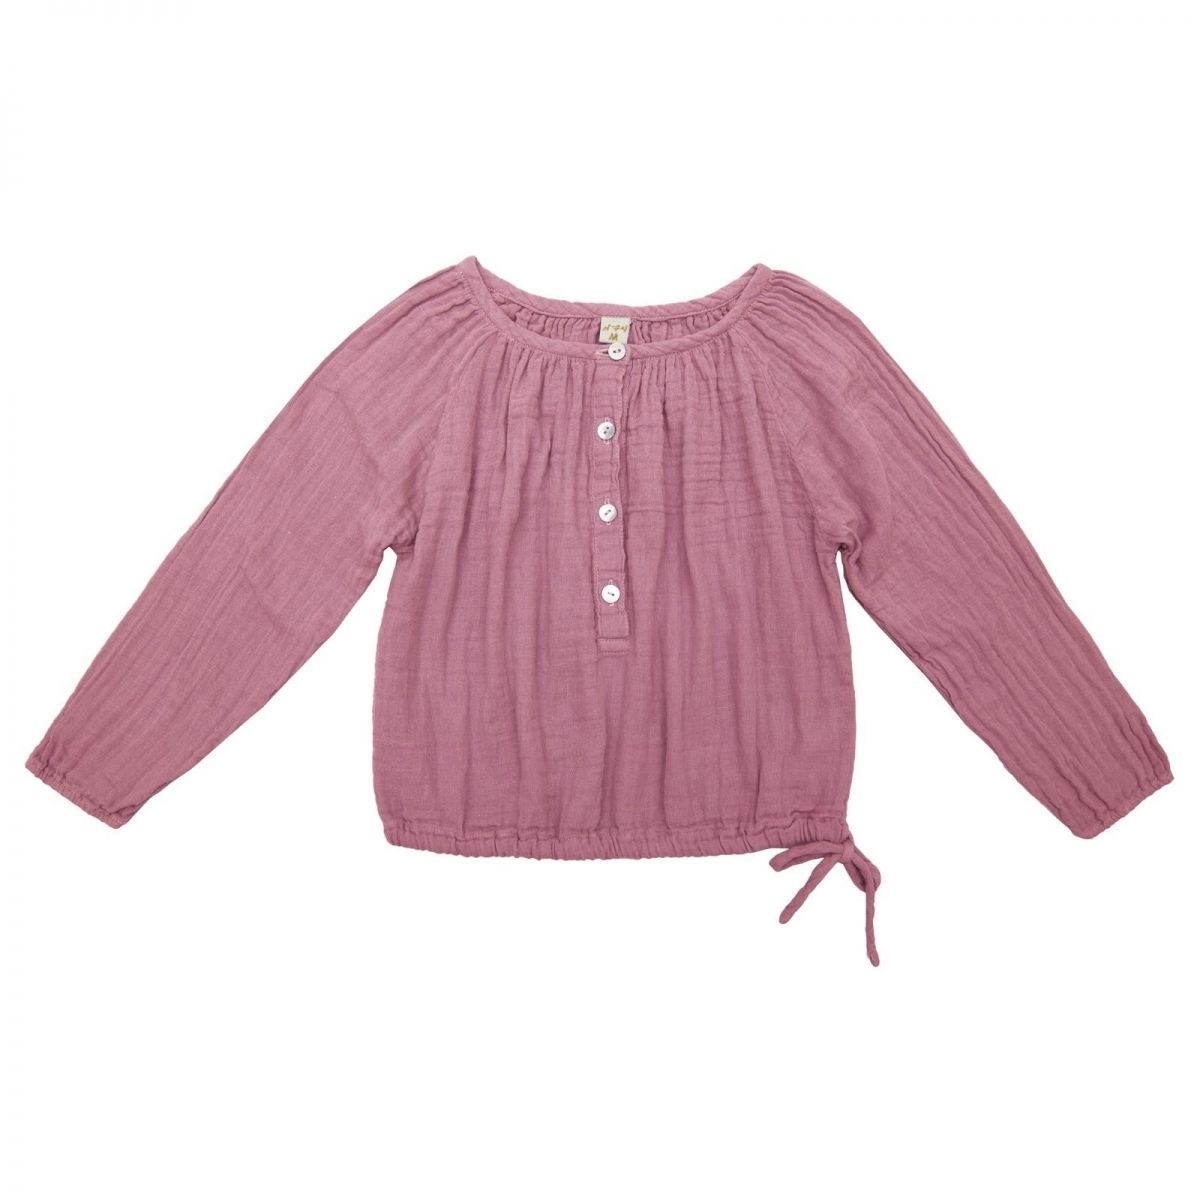 Shirt Naia baobab rose - Numero 74